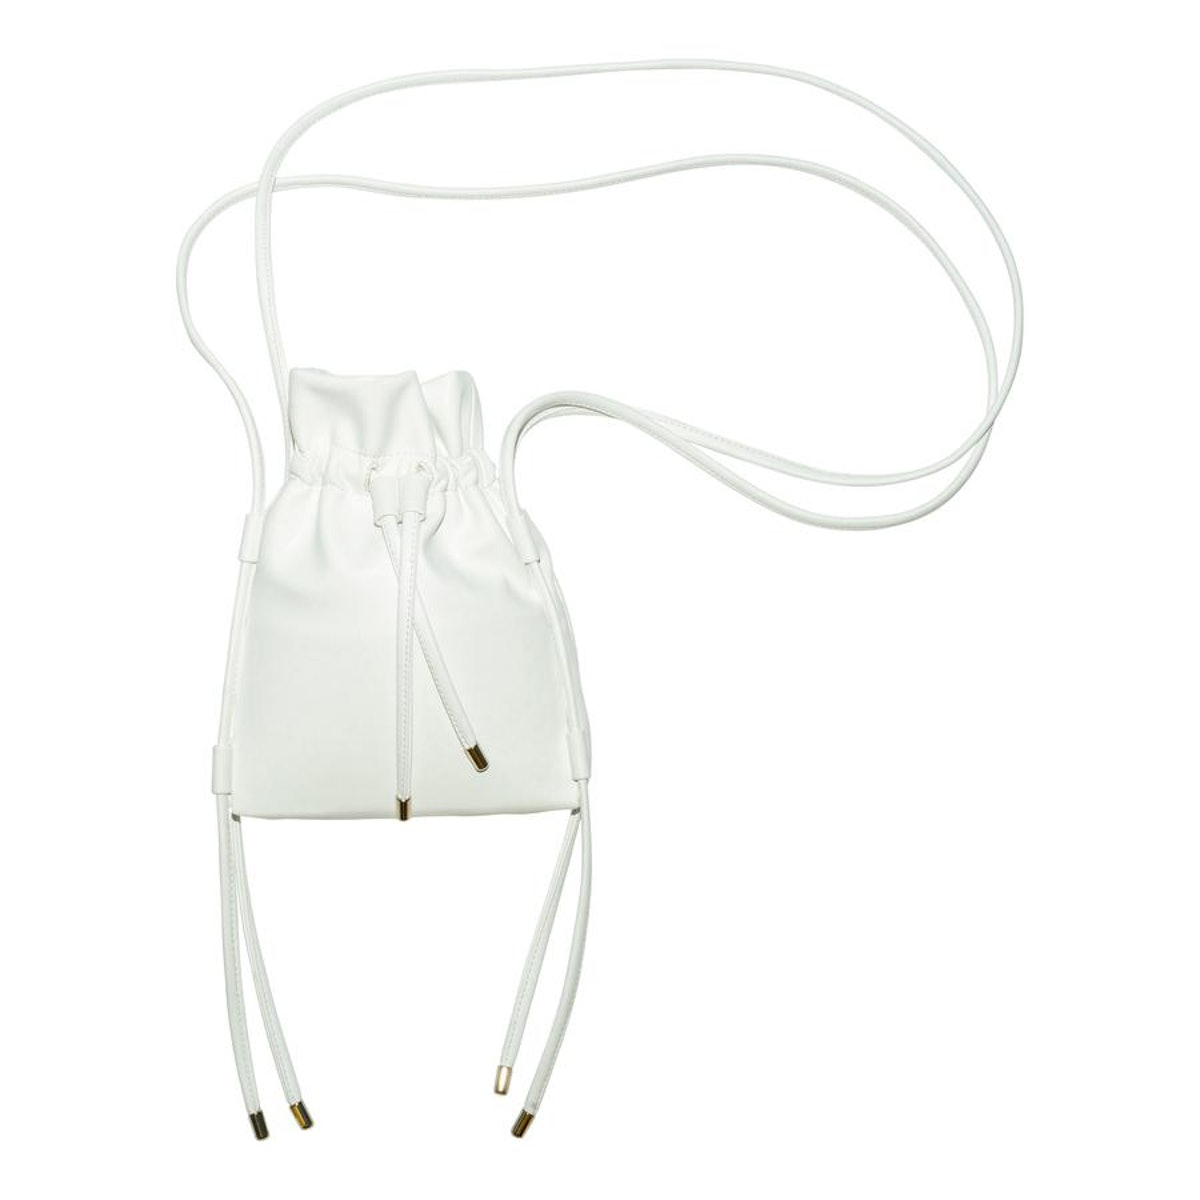 hozen sling pouch